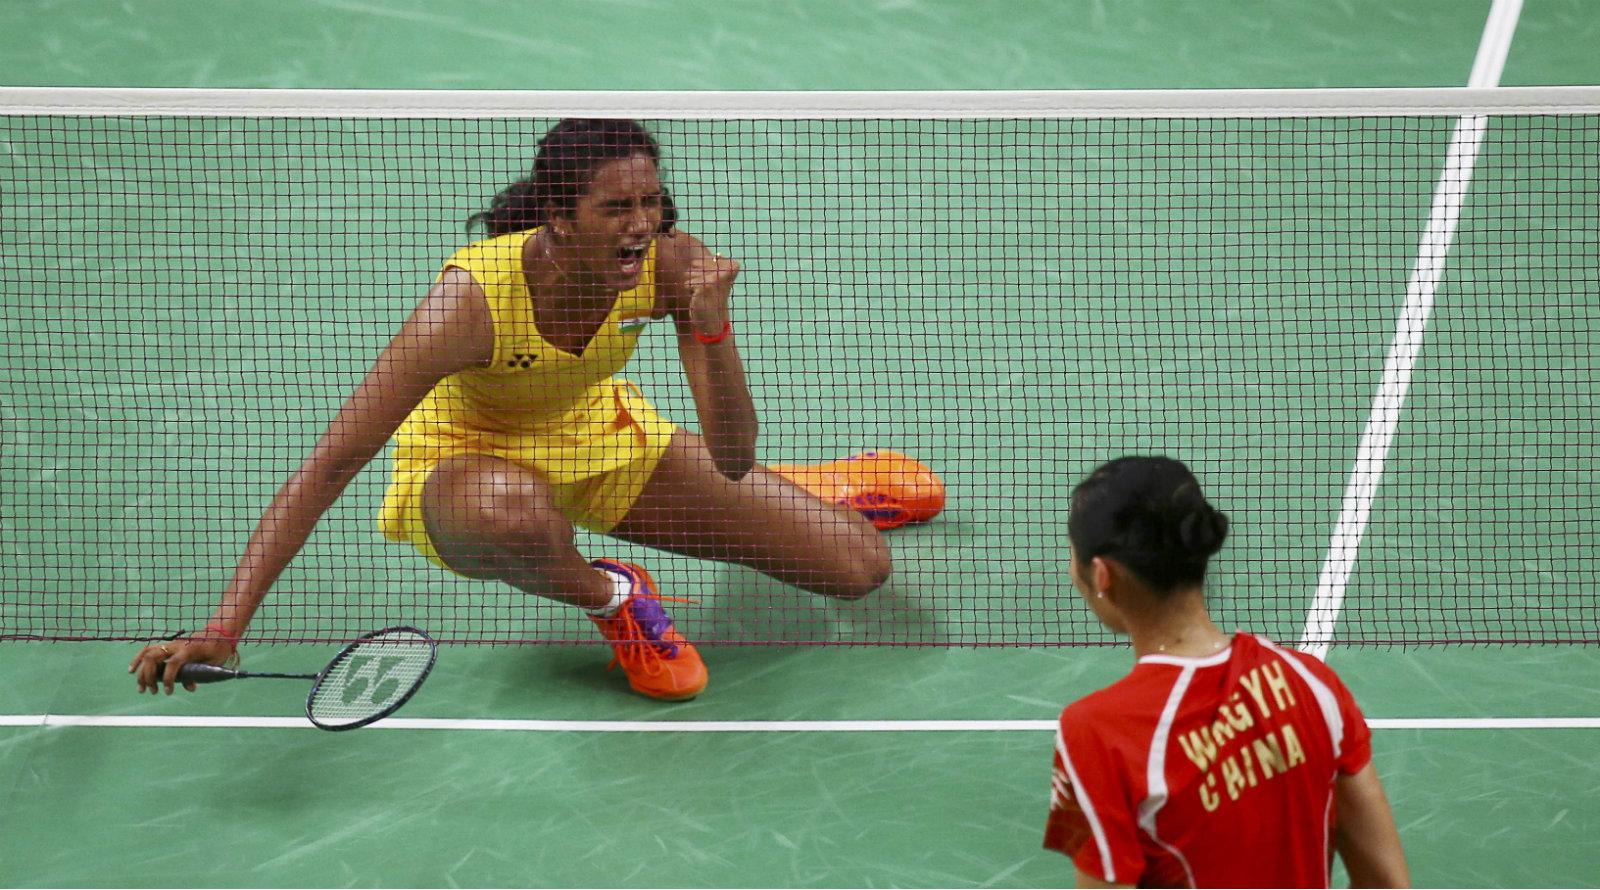 India's P.V. Sindhu celebrates after winning her match against Wang Yihan of China.